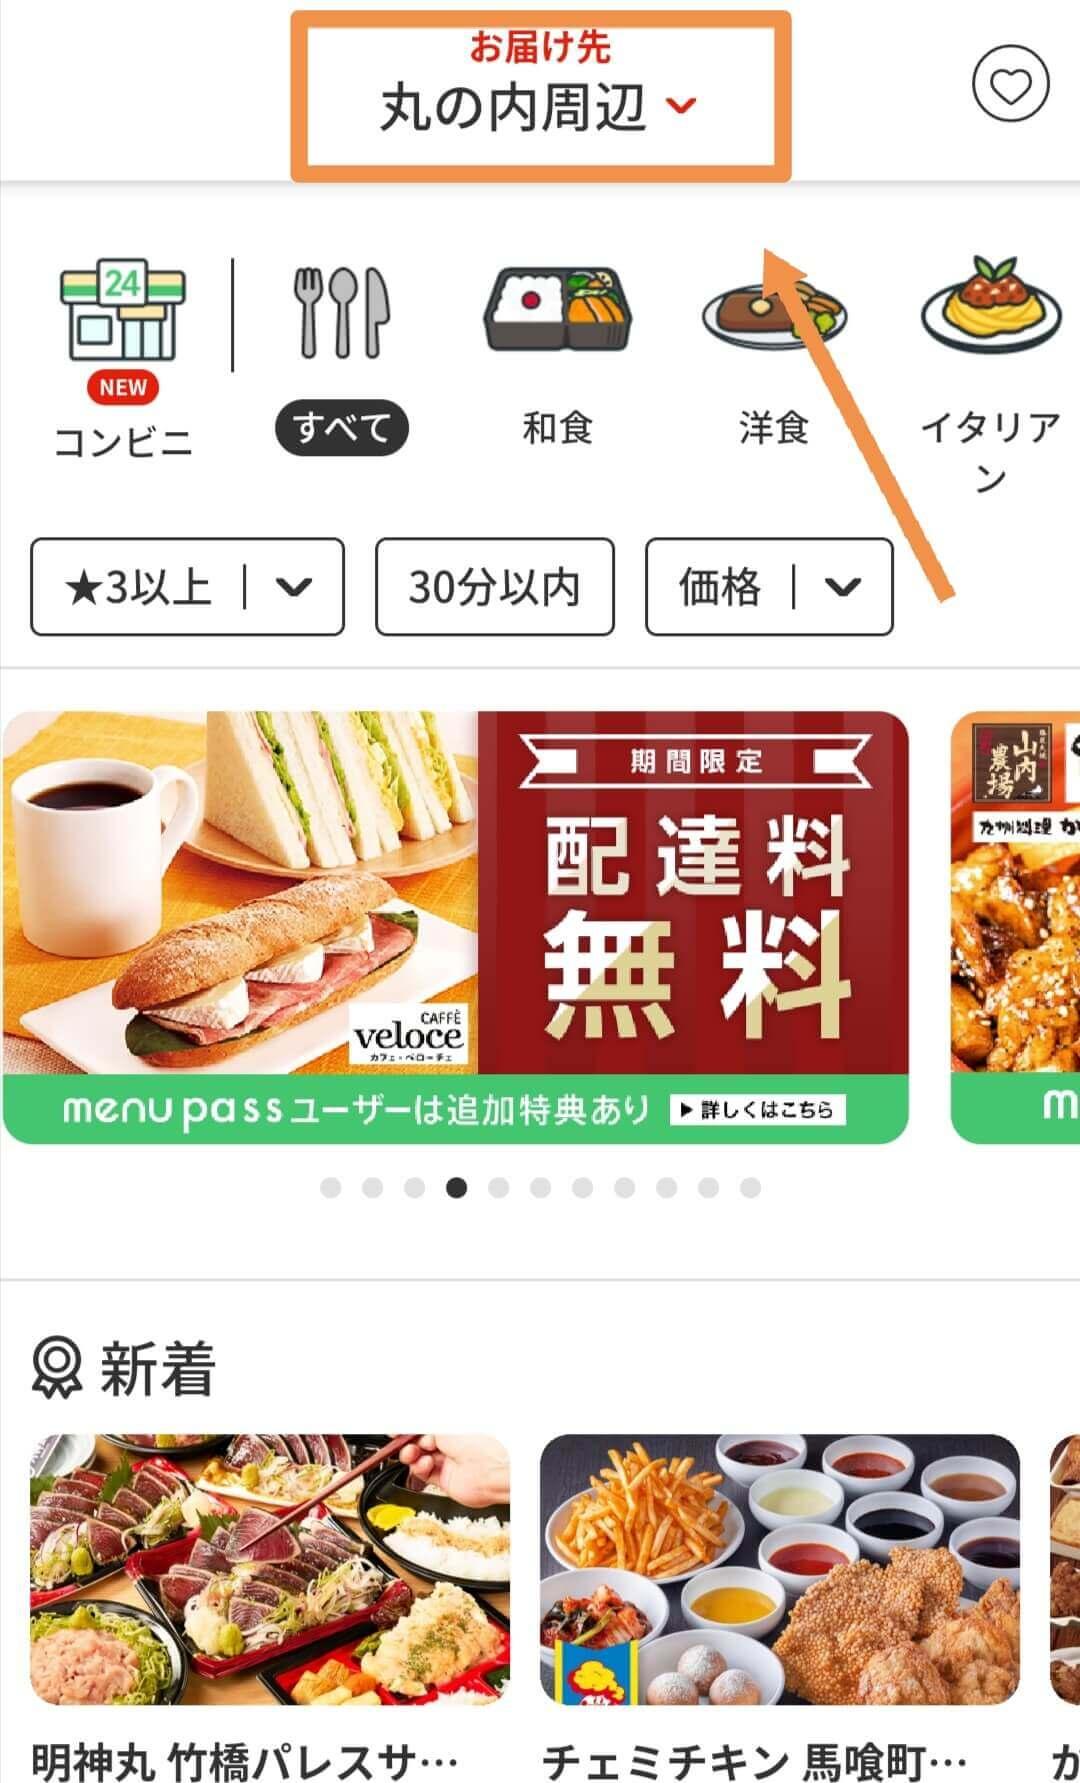 menu/メニュー東京エリア・配達対応地域の確認方法1